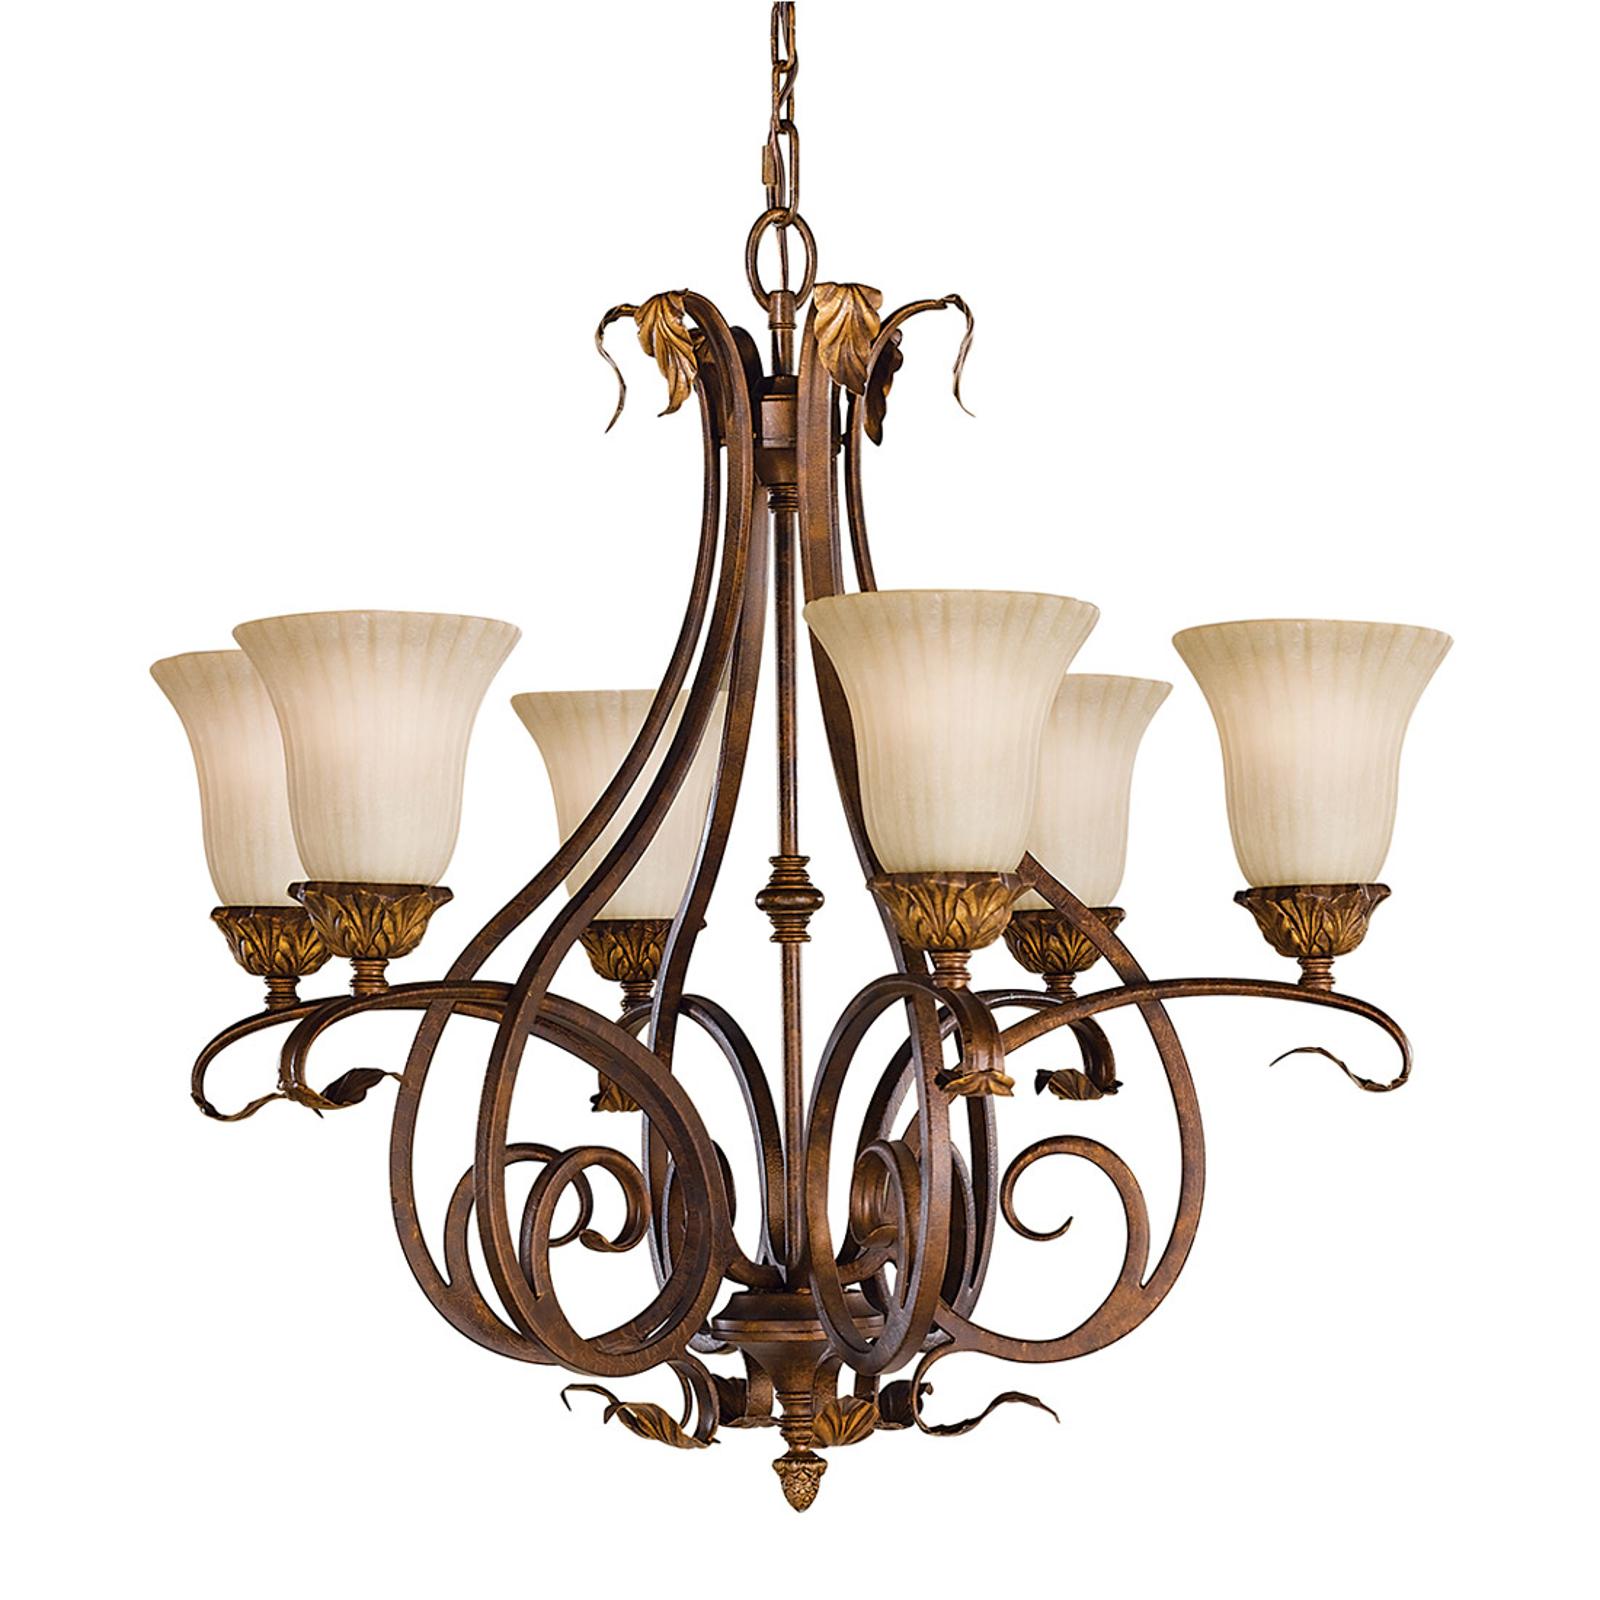 Impressive chandelier Sonoma Valley_3048302_1